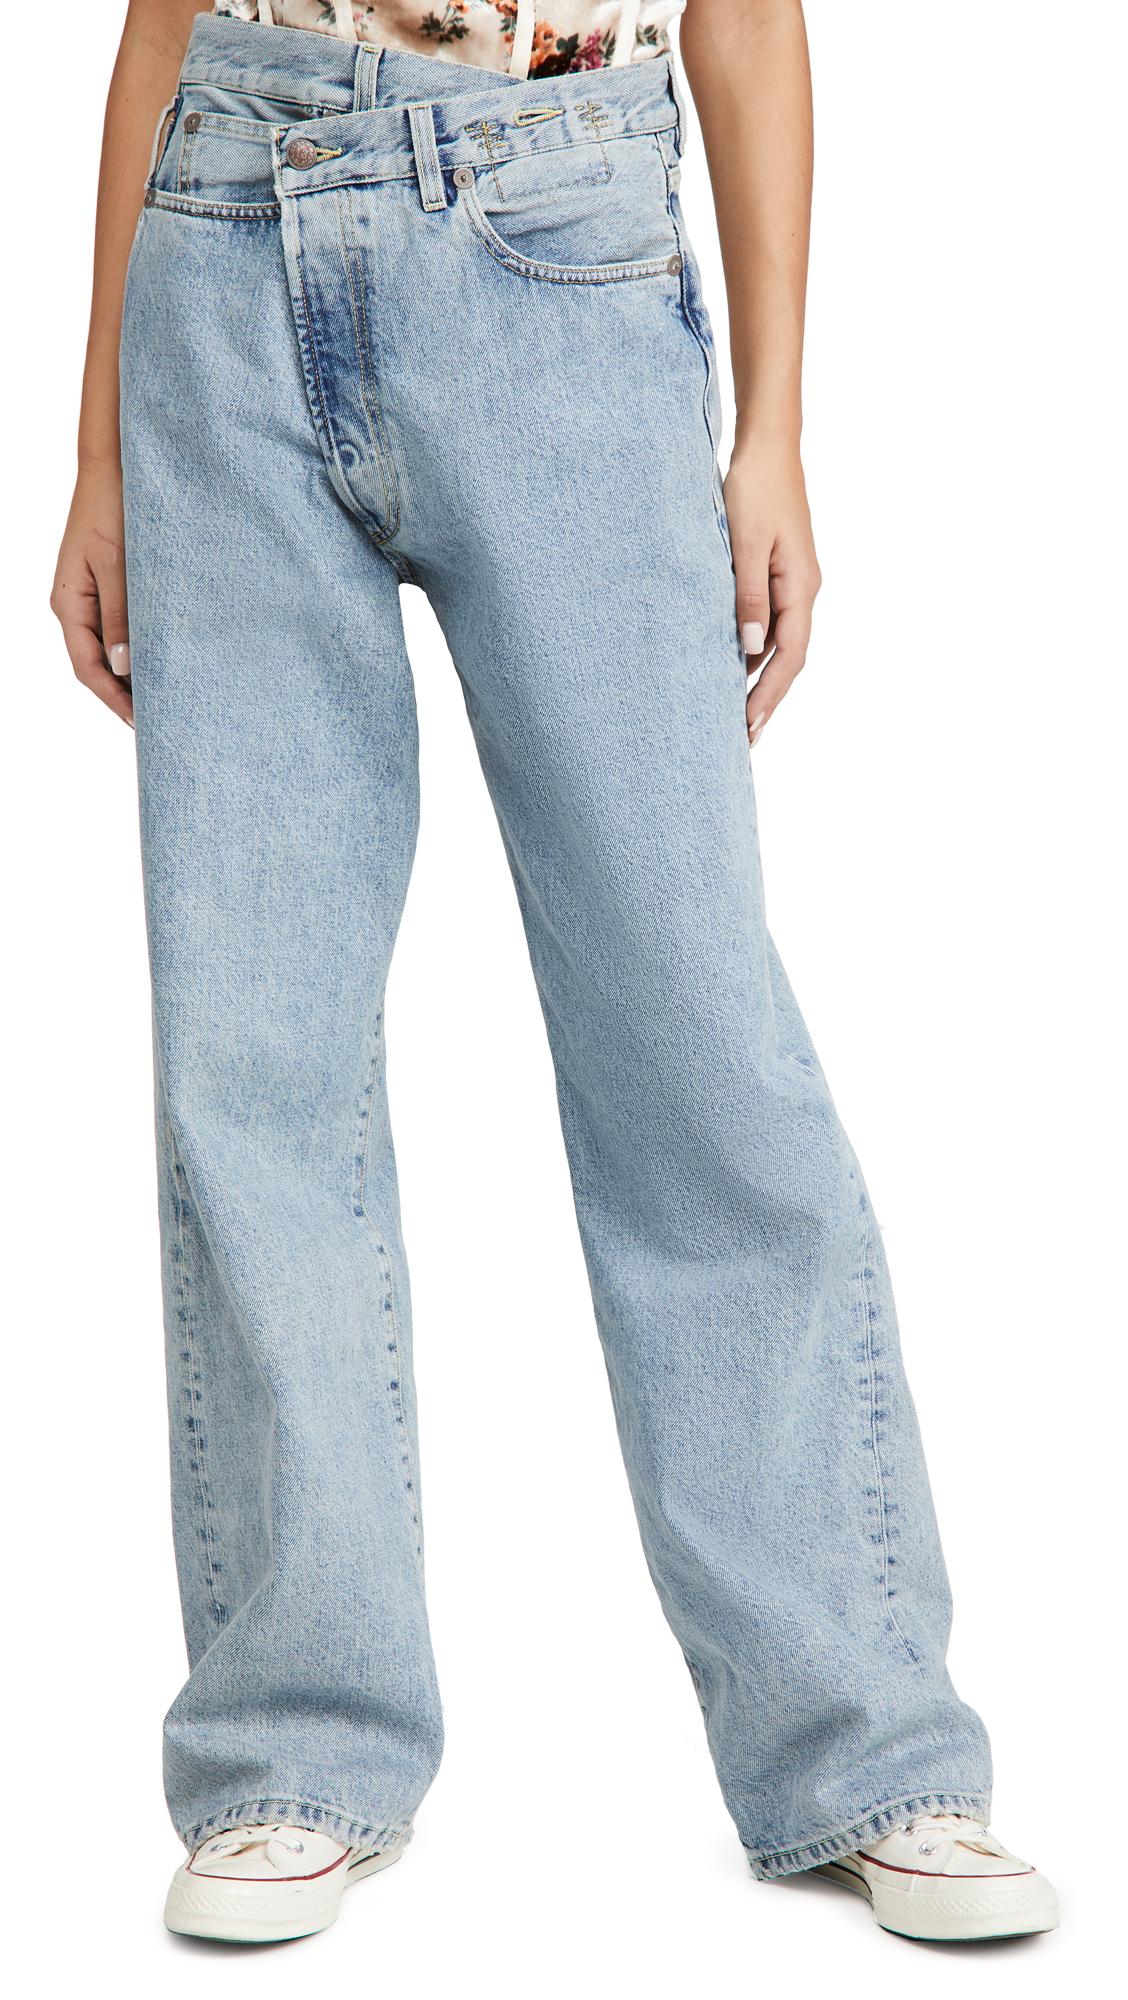 R13 Wide Leg Cross Over Jeans